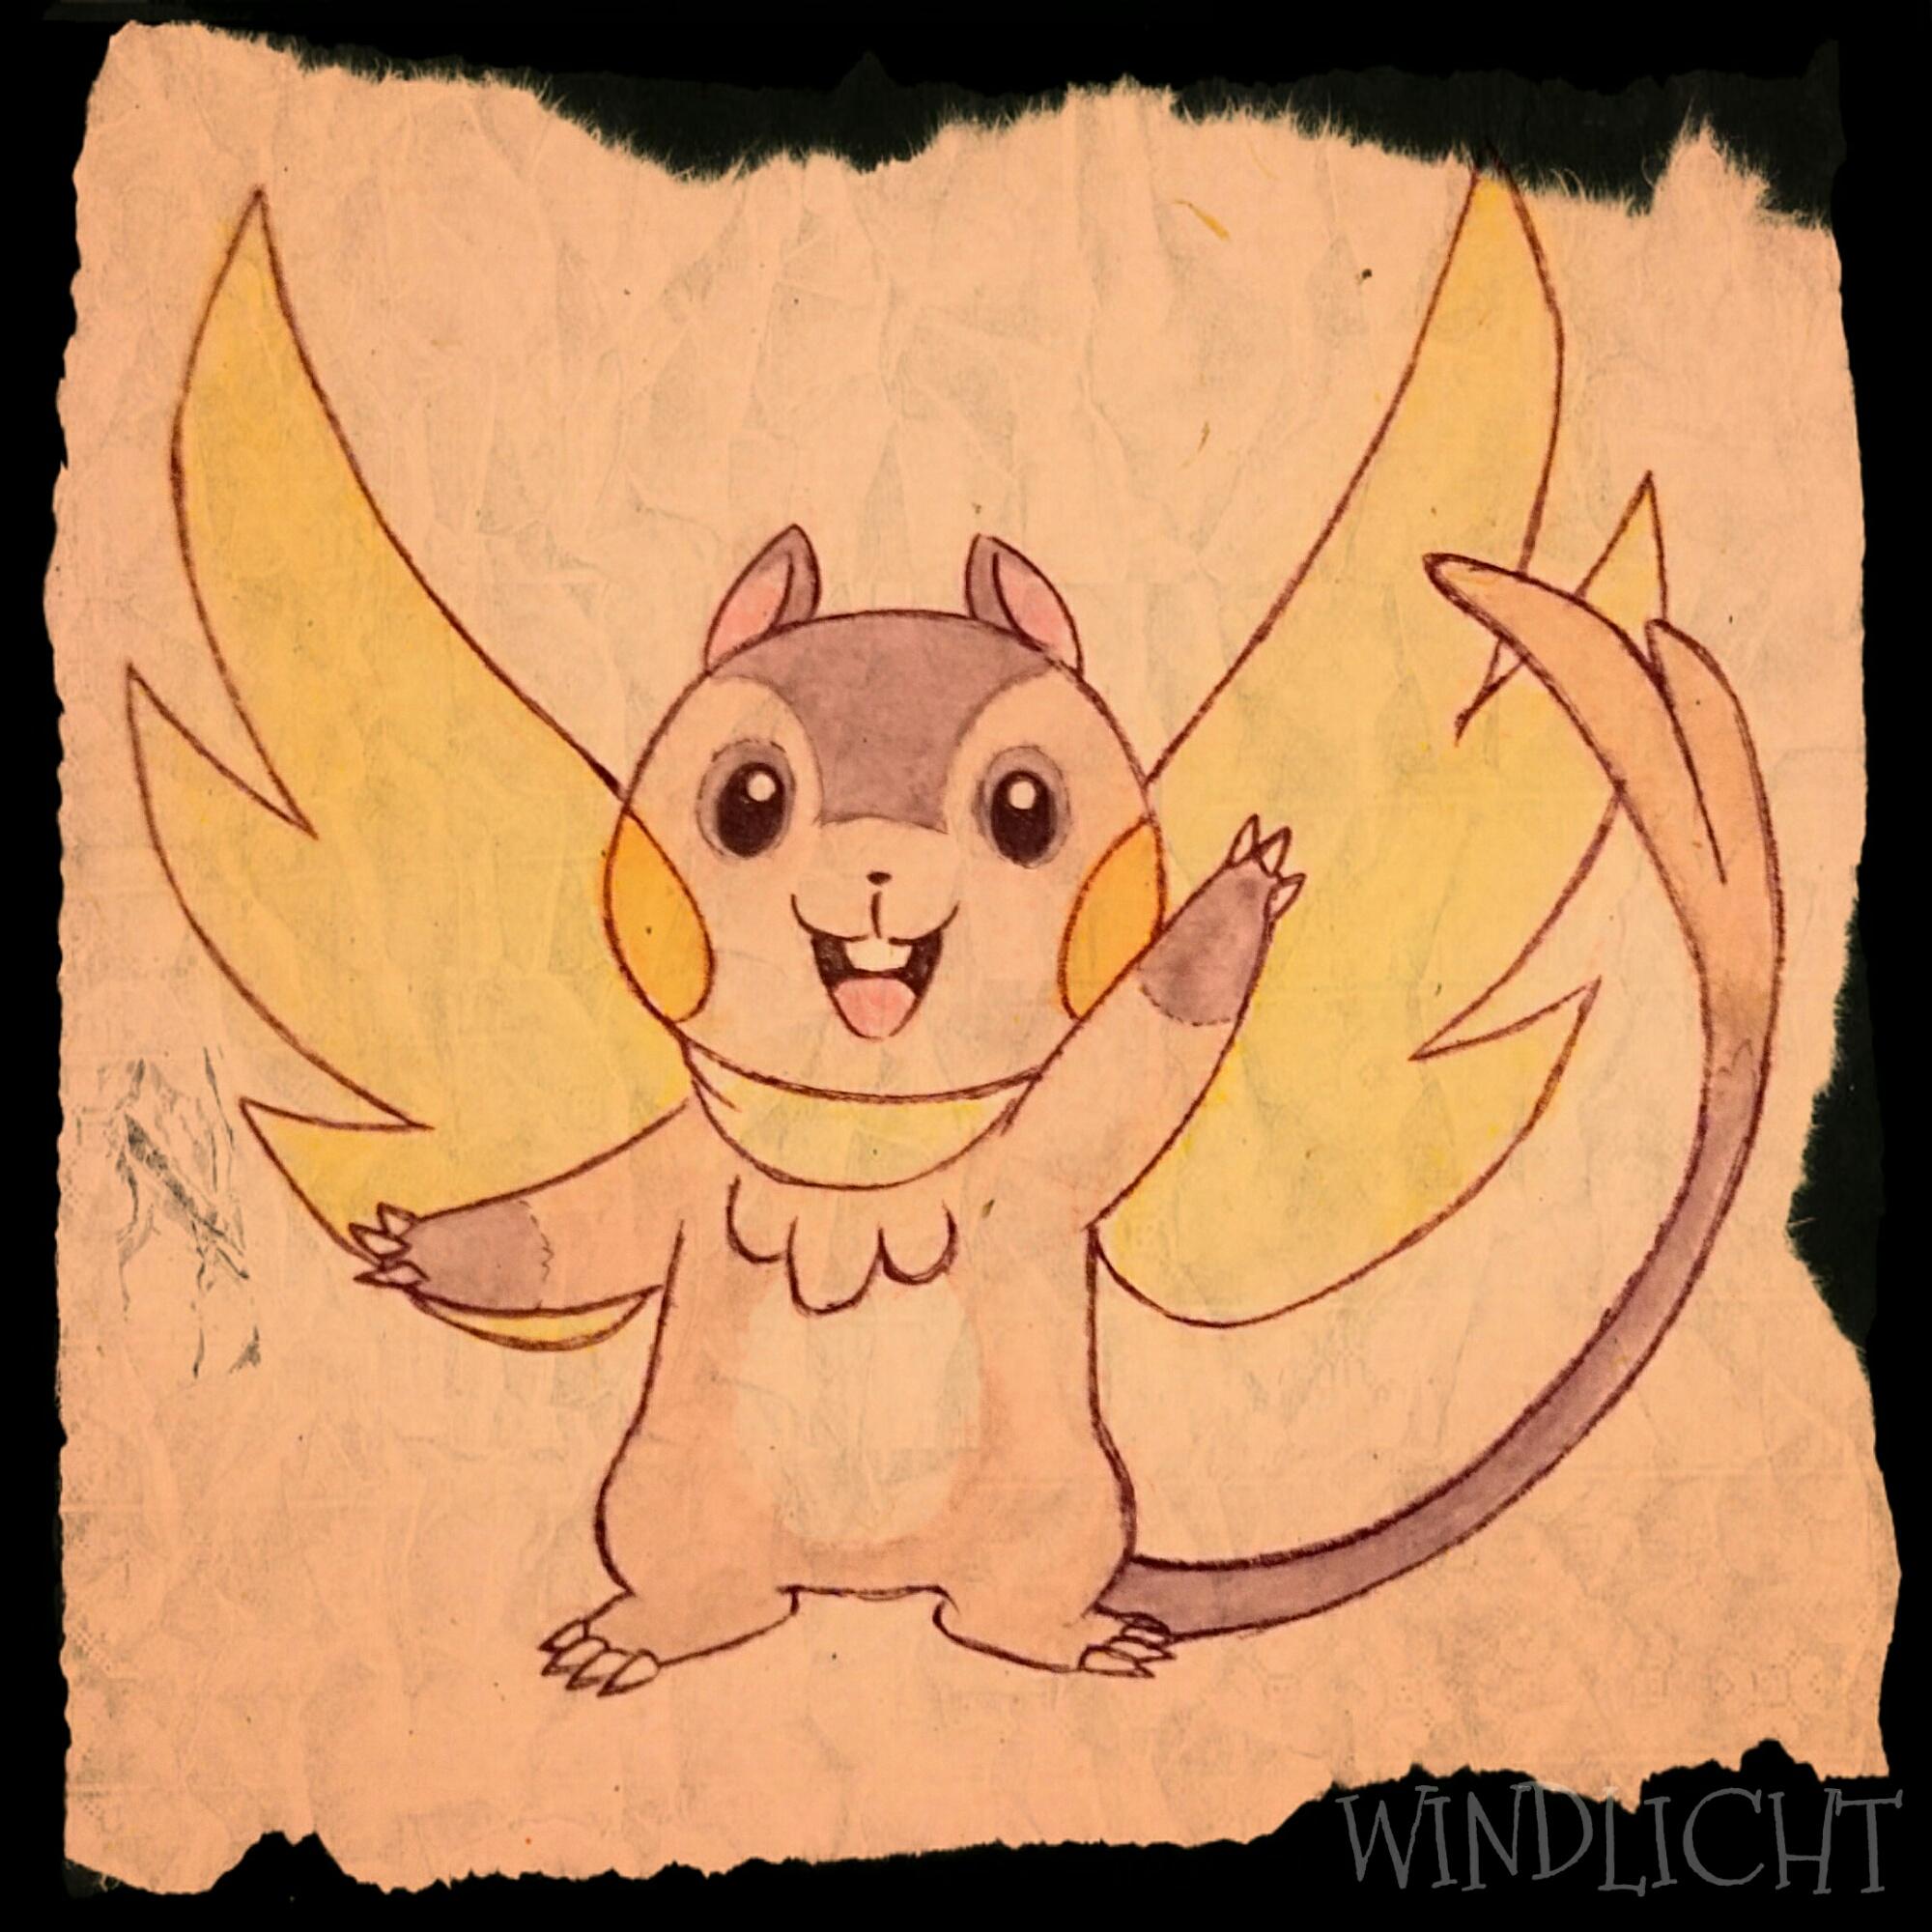 Pokémon-Zeichnung: Elektromaus Pokemon